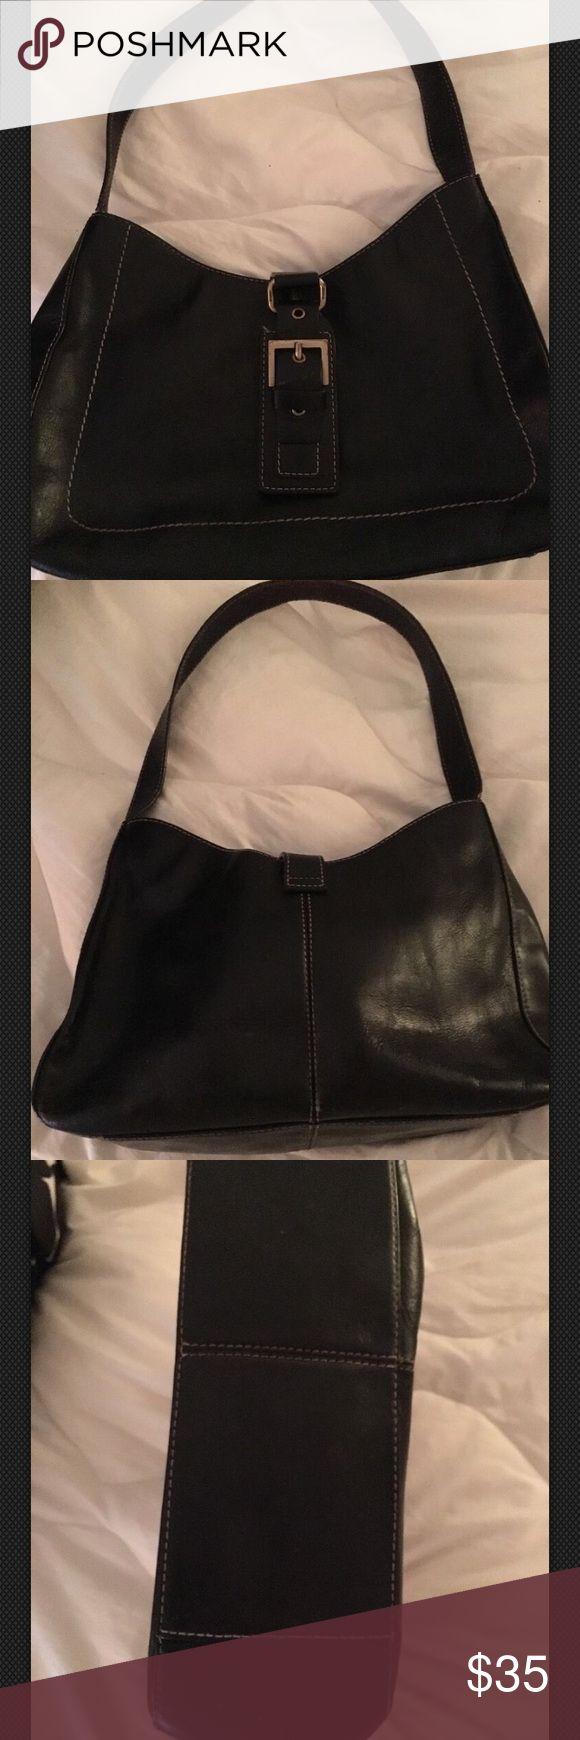 "Vintage Etienne Aigner Bag Hobo Shoulder Black Vintage Etienne Aigner Handbag Purse Hobo Shoulder Bag Black Leather 7x11x3 with a 12"" drop Etienne Aigner Bags Hobos"